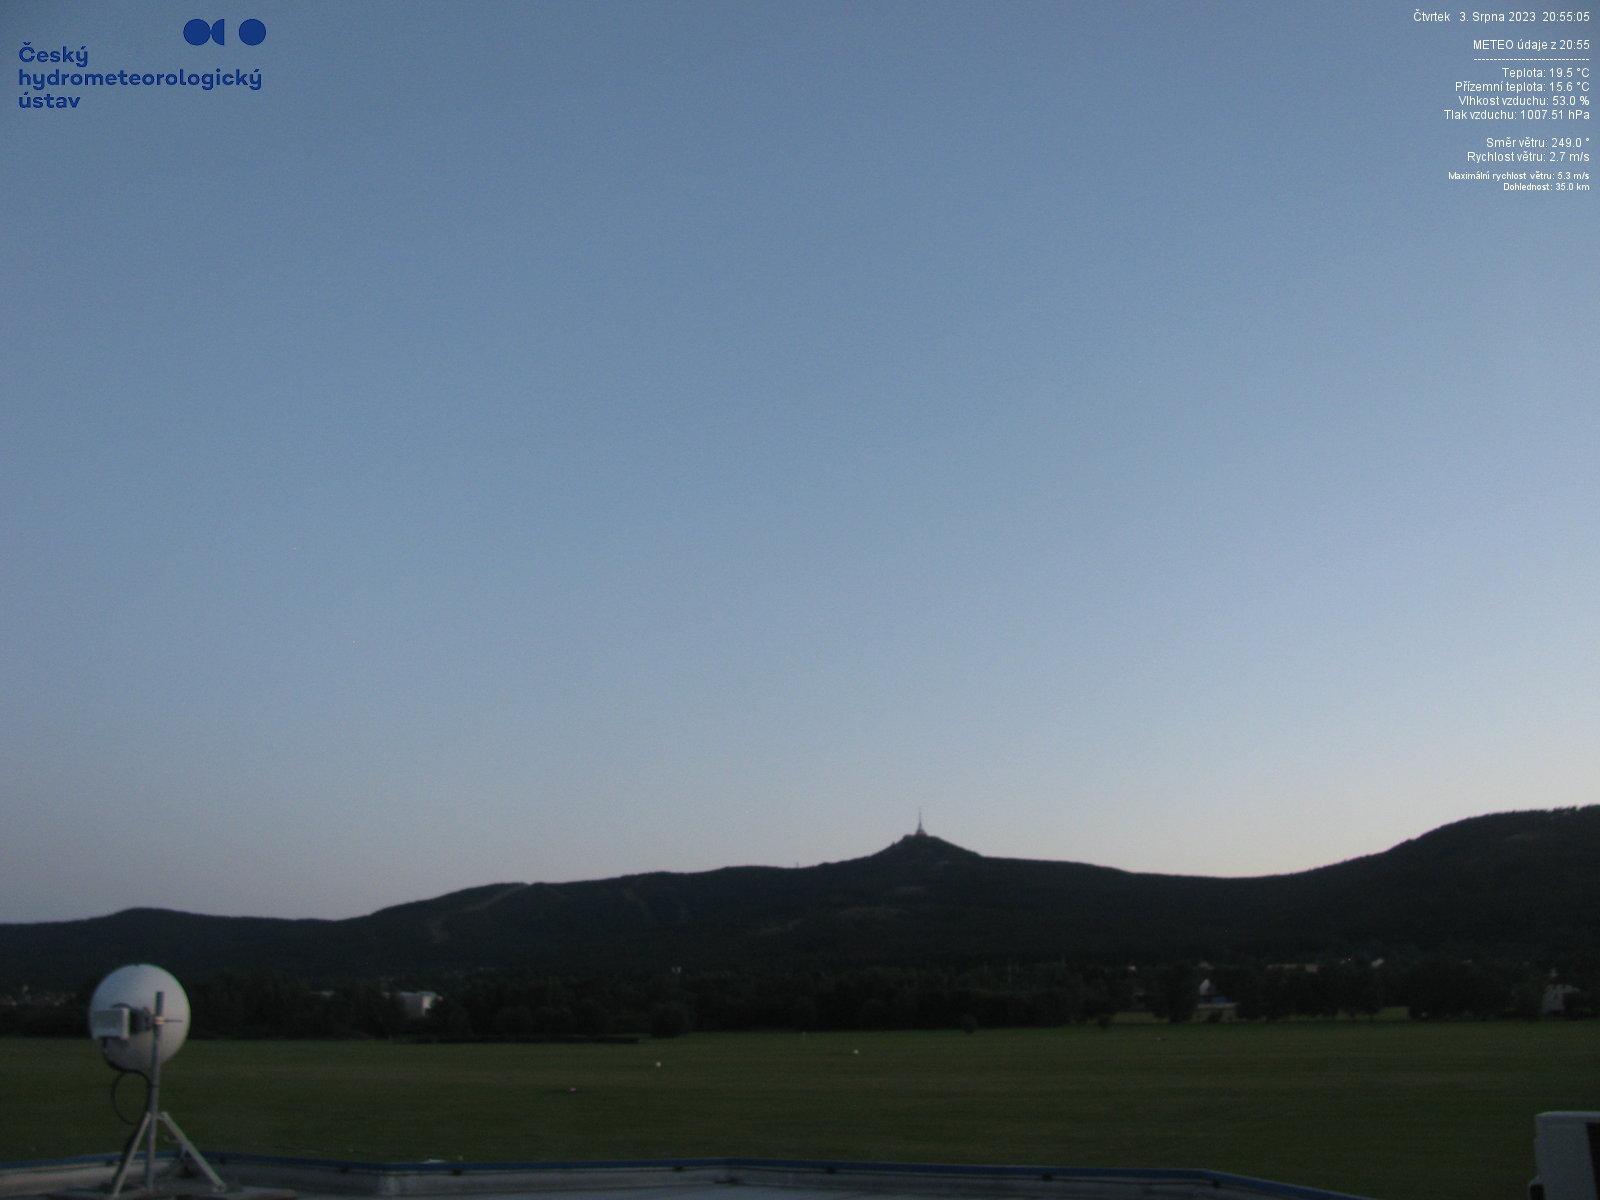 Webkamera - Liberec